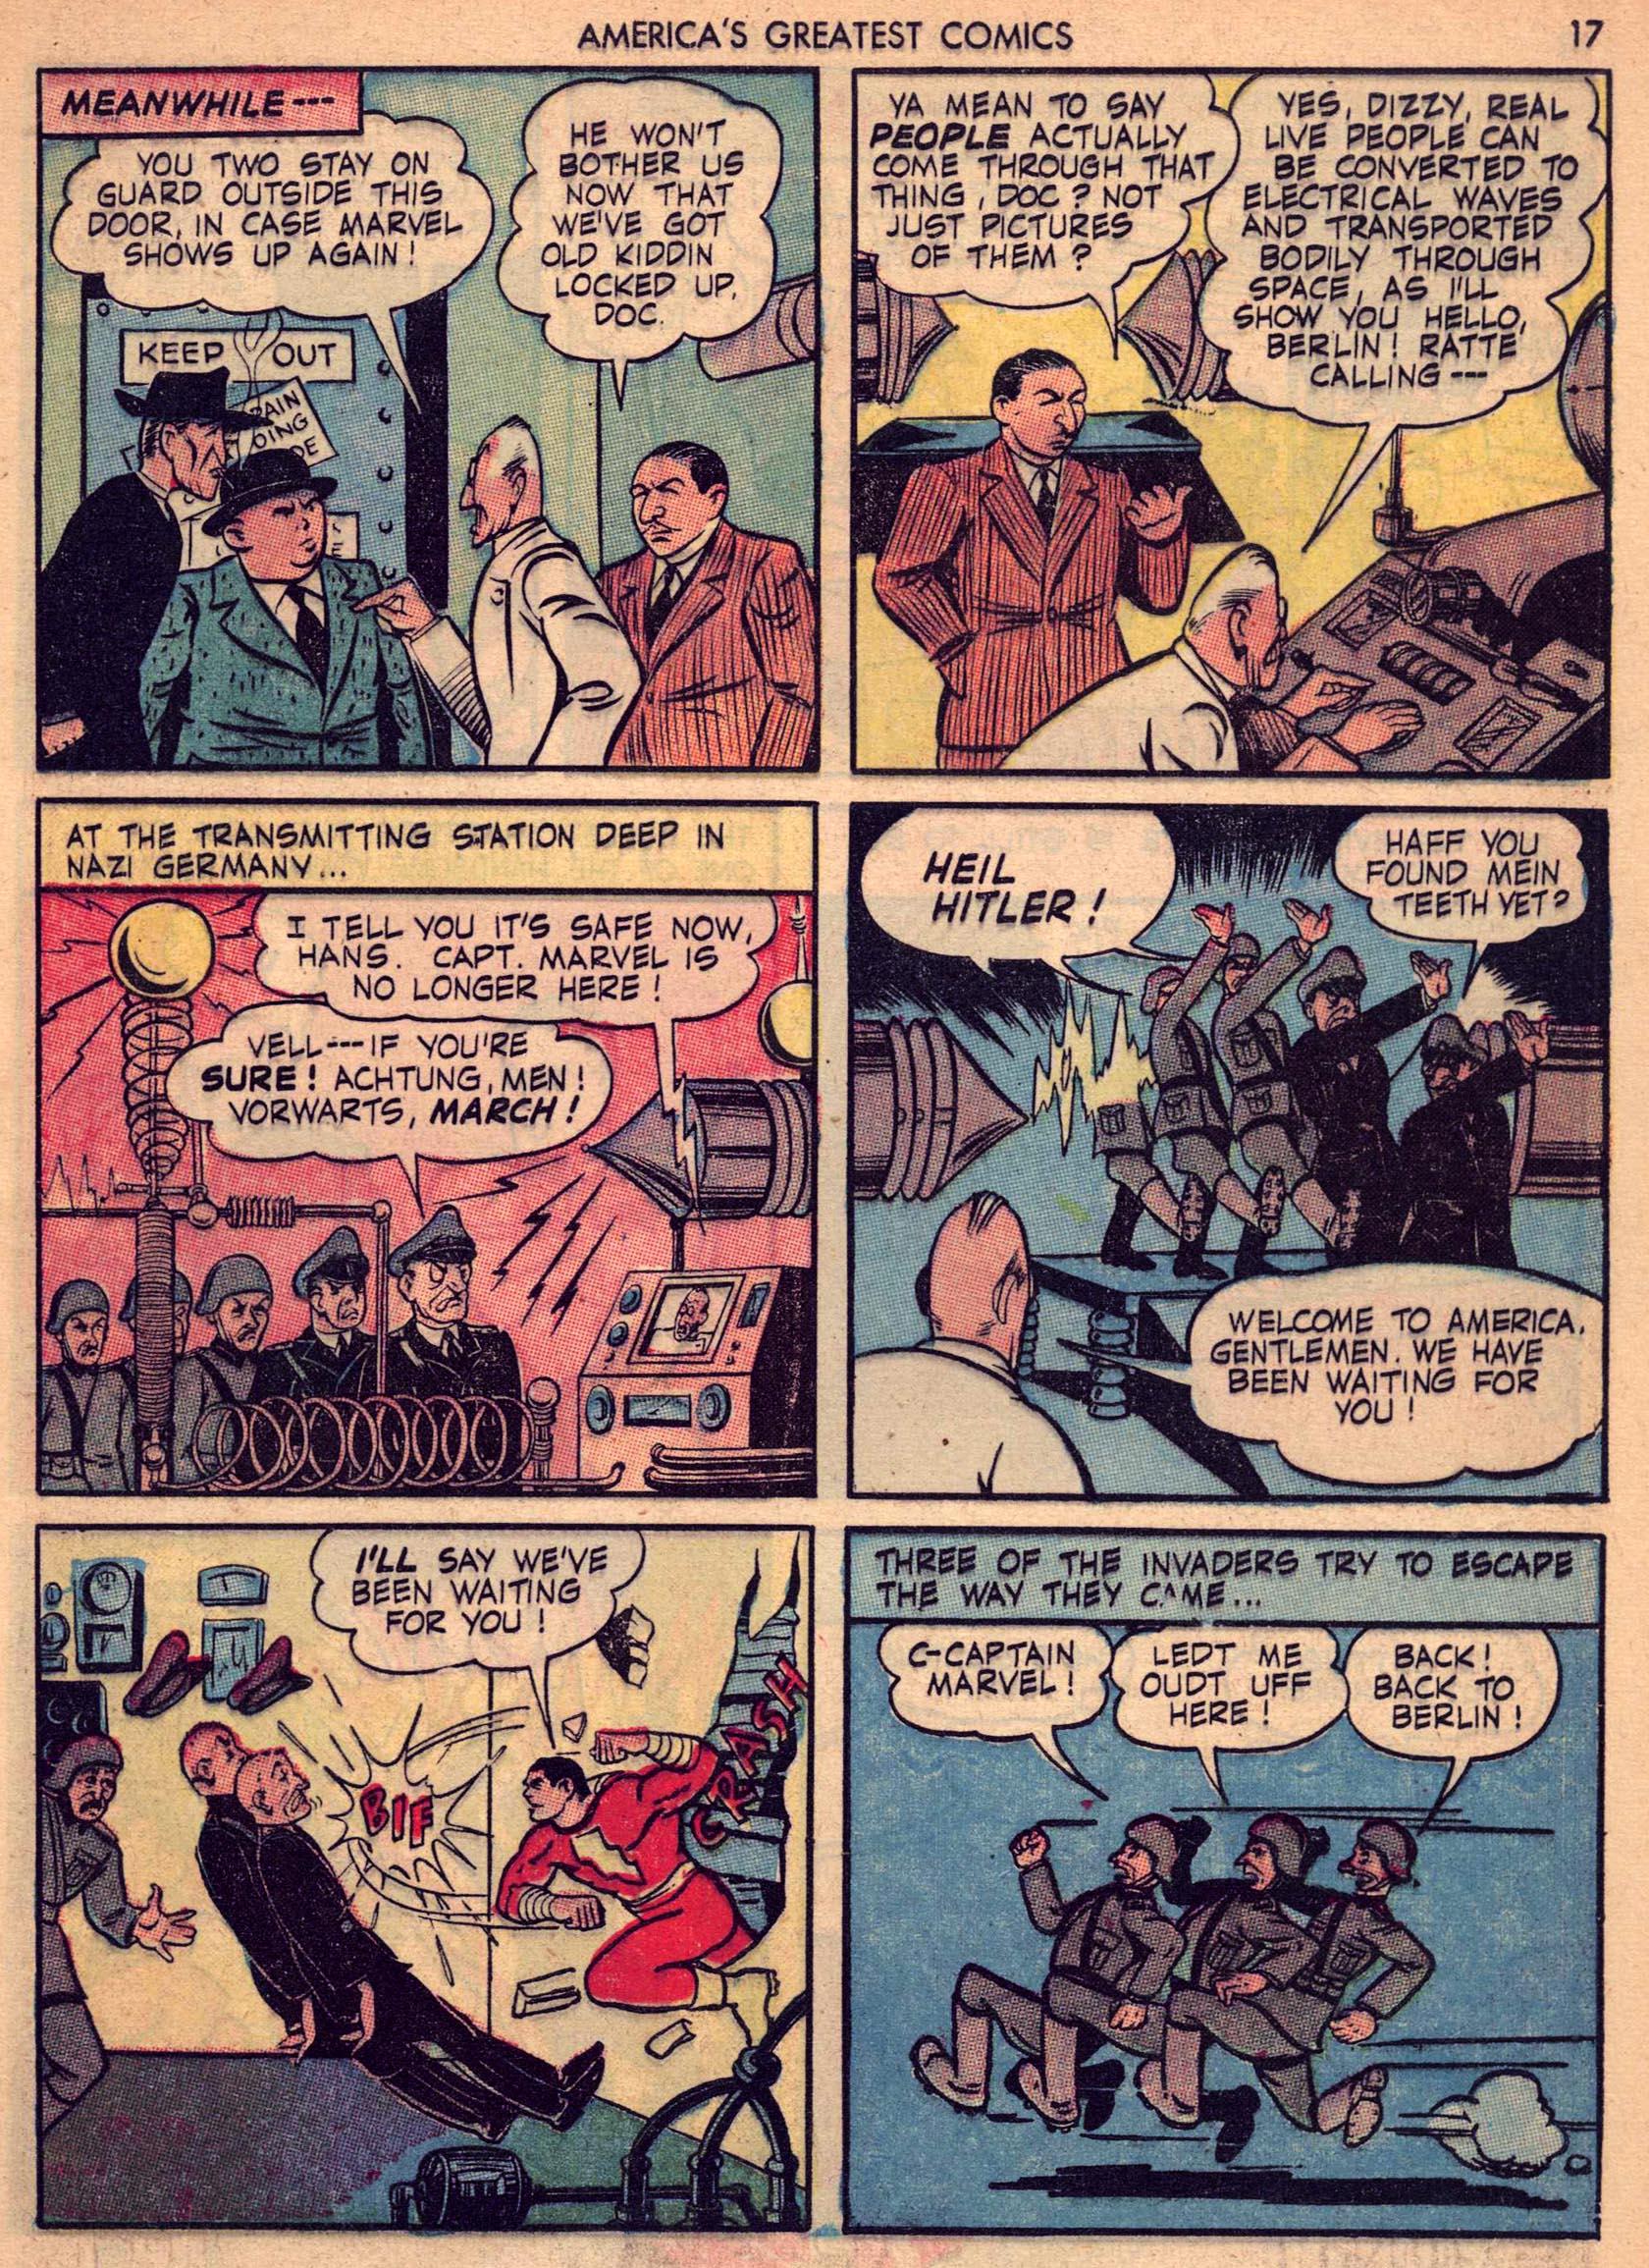 Read online America's Greatest Comics comic -  Issue #7 - 16